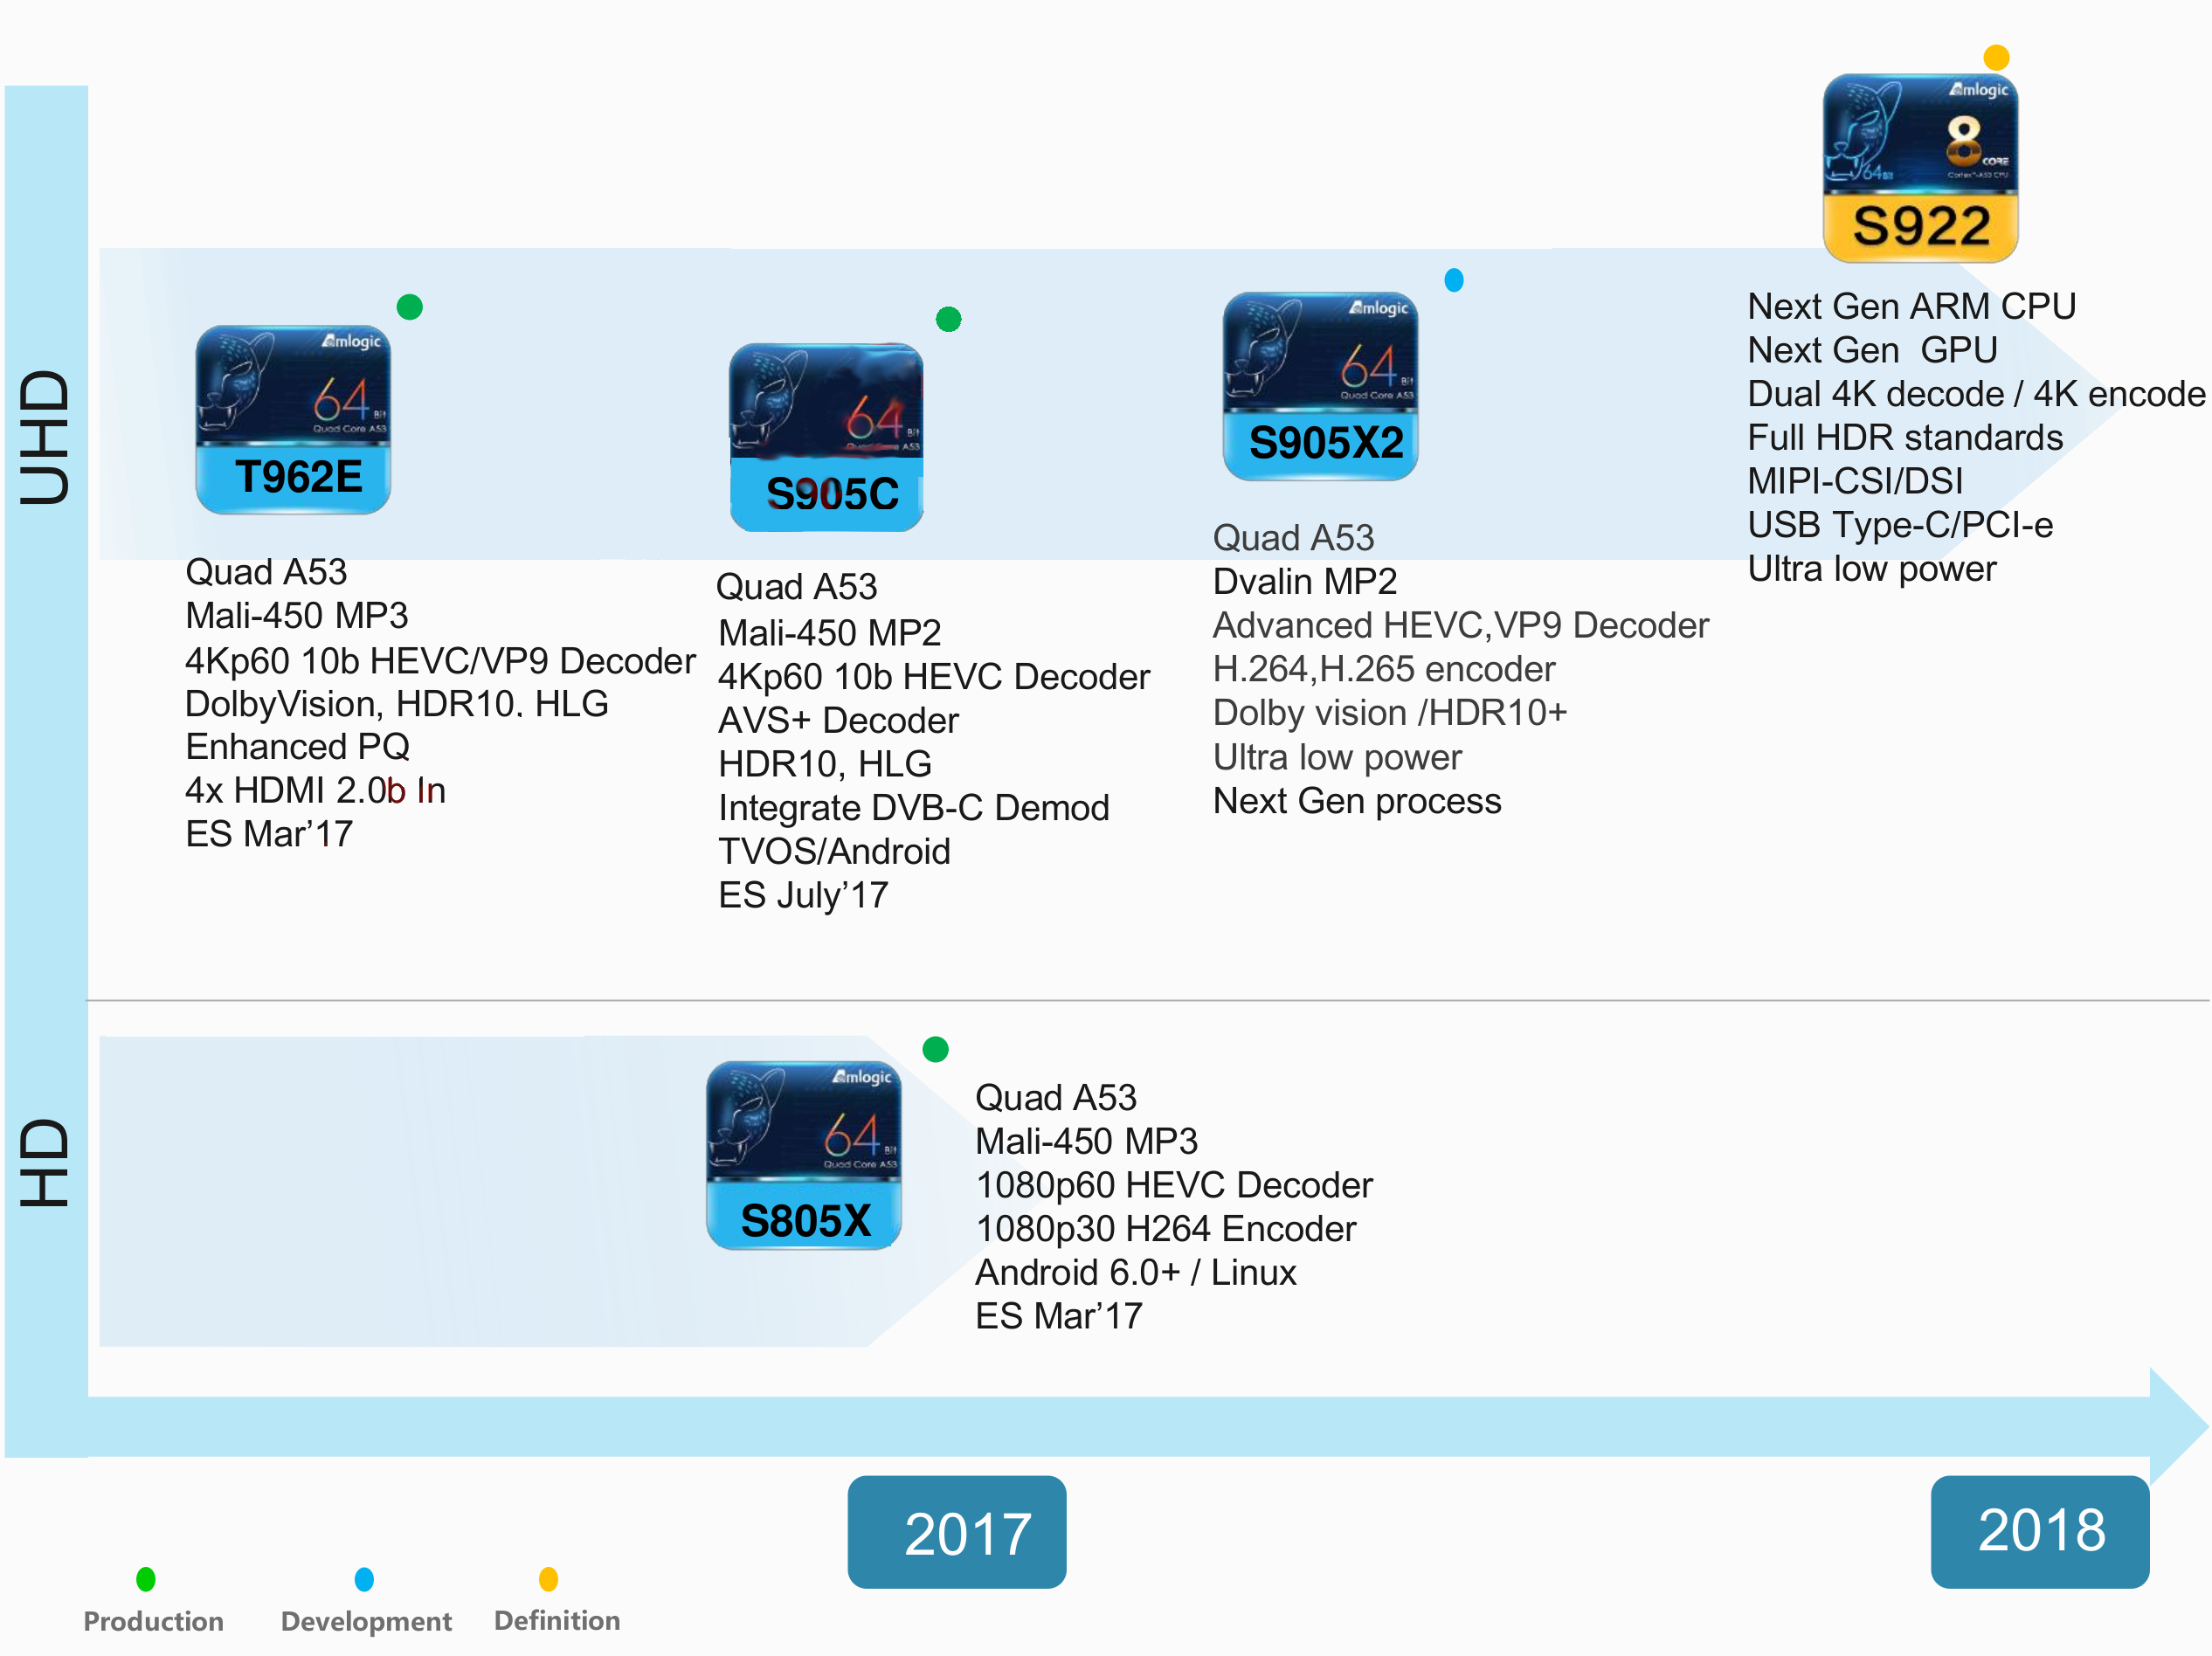 Amlogic 2018 Roadmap Reveals S905X2, S905C, and S922 Processors